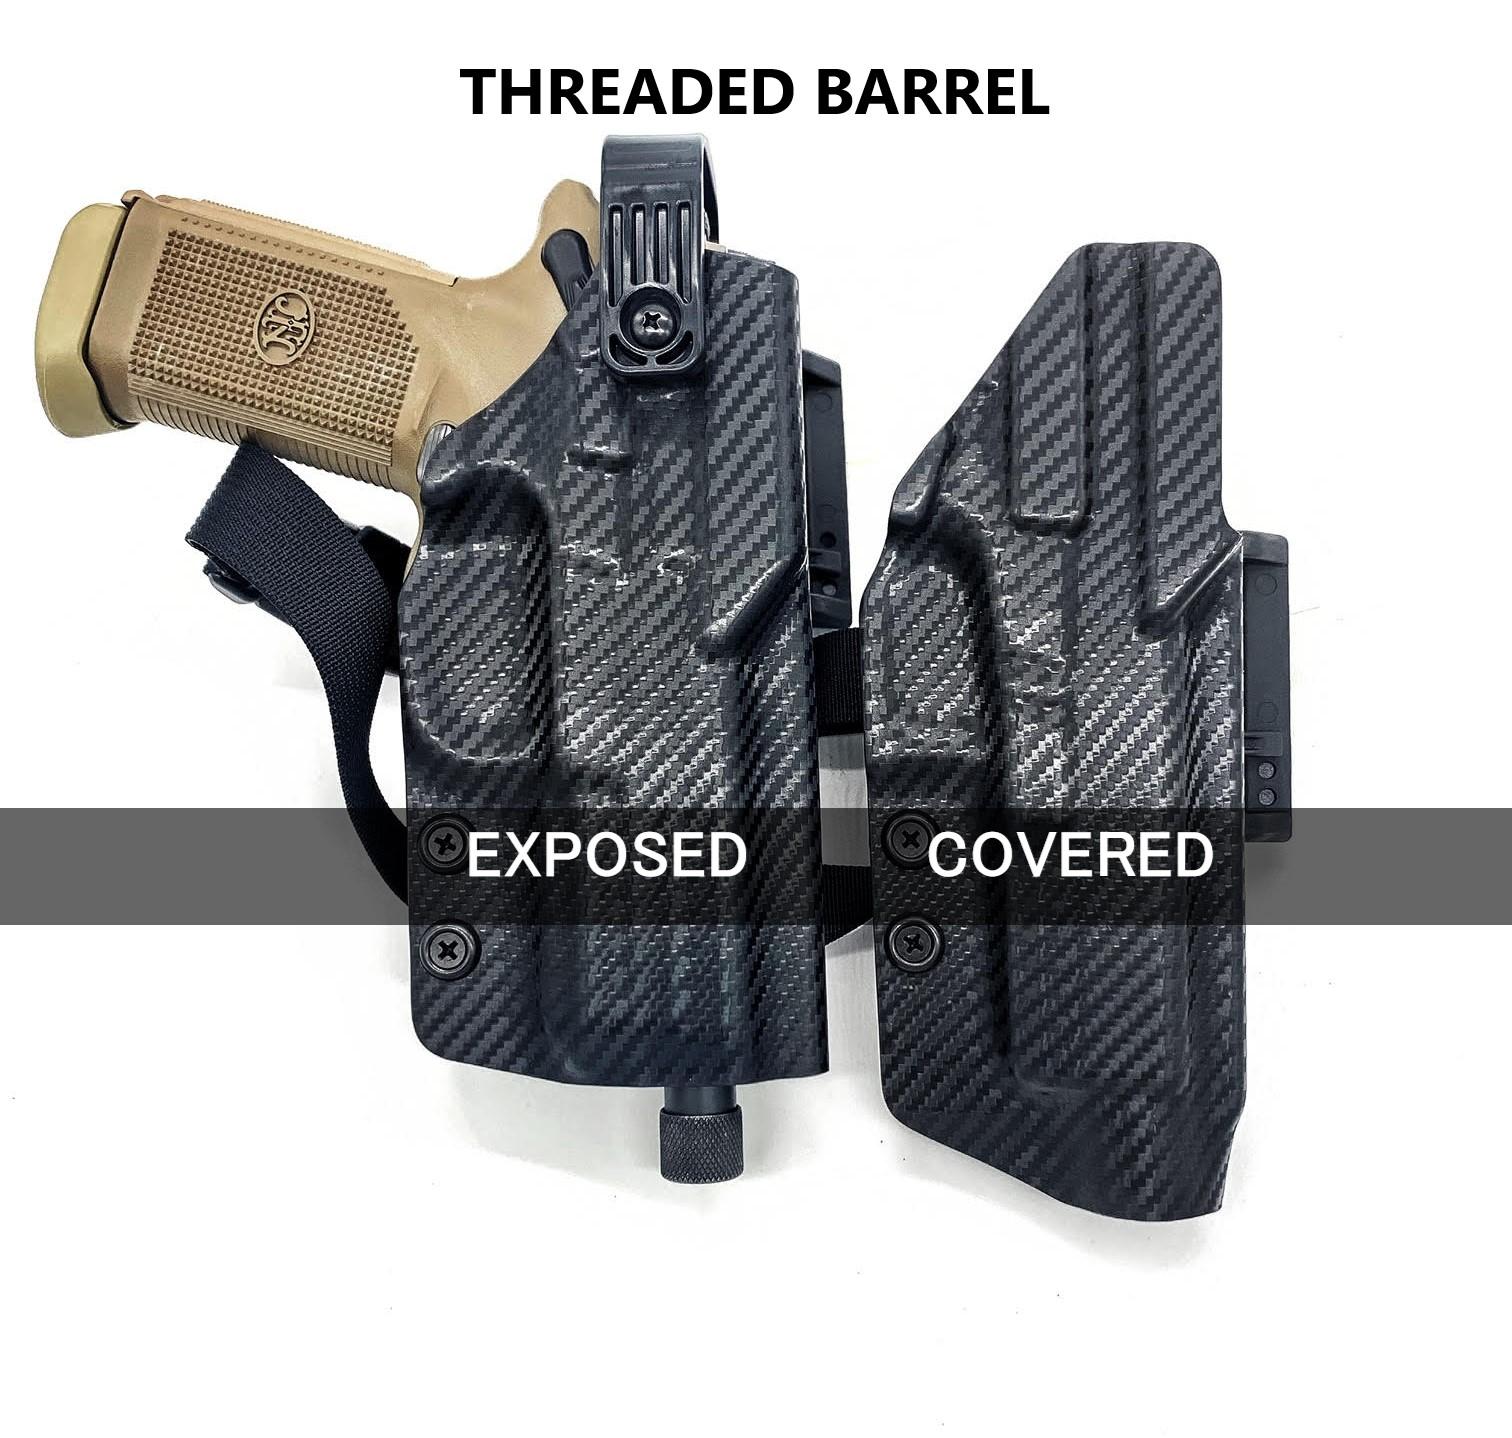 threaded-barrel-coverage.jpg